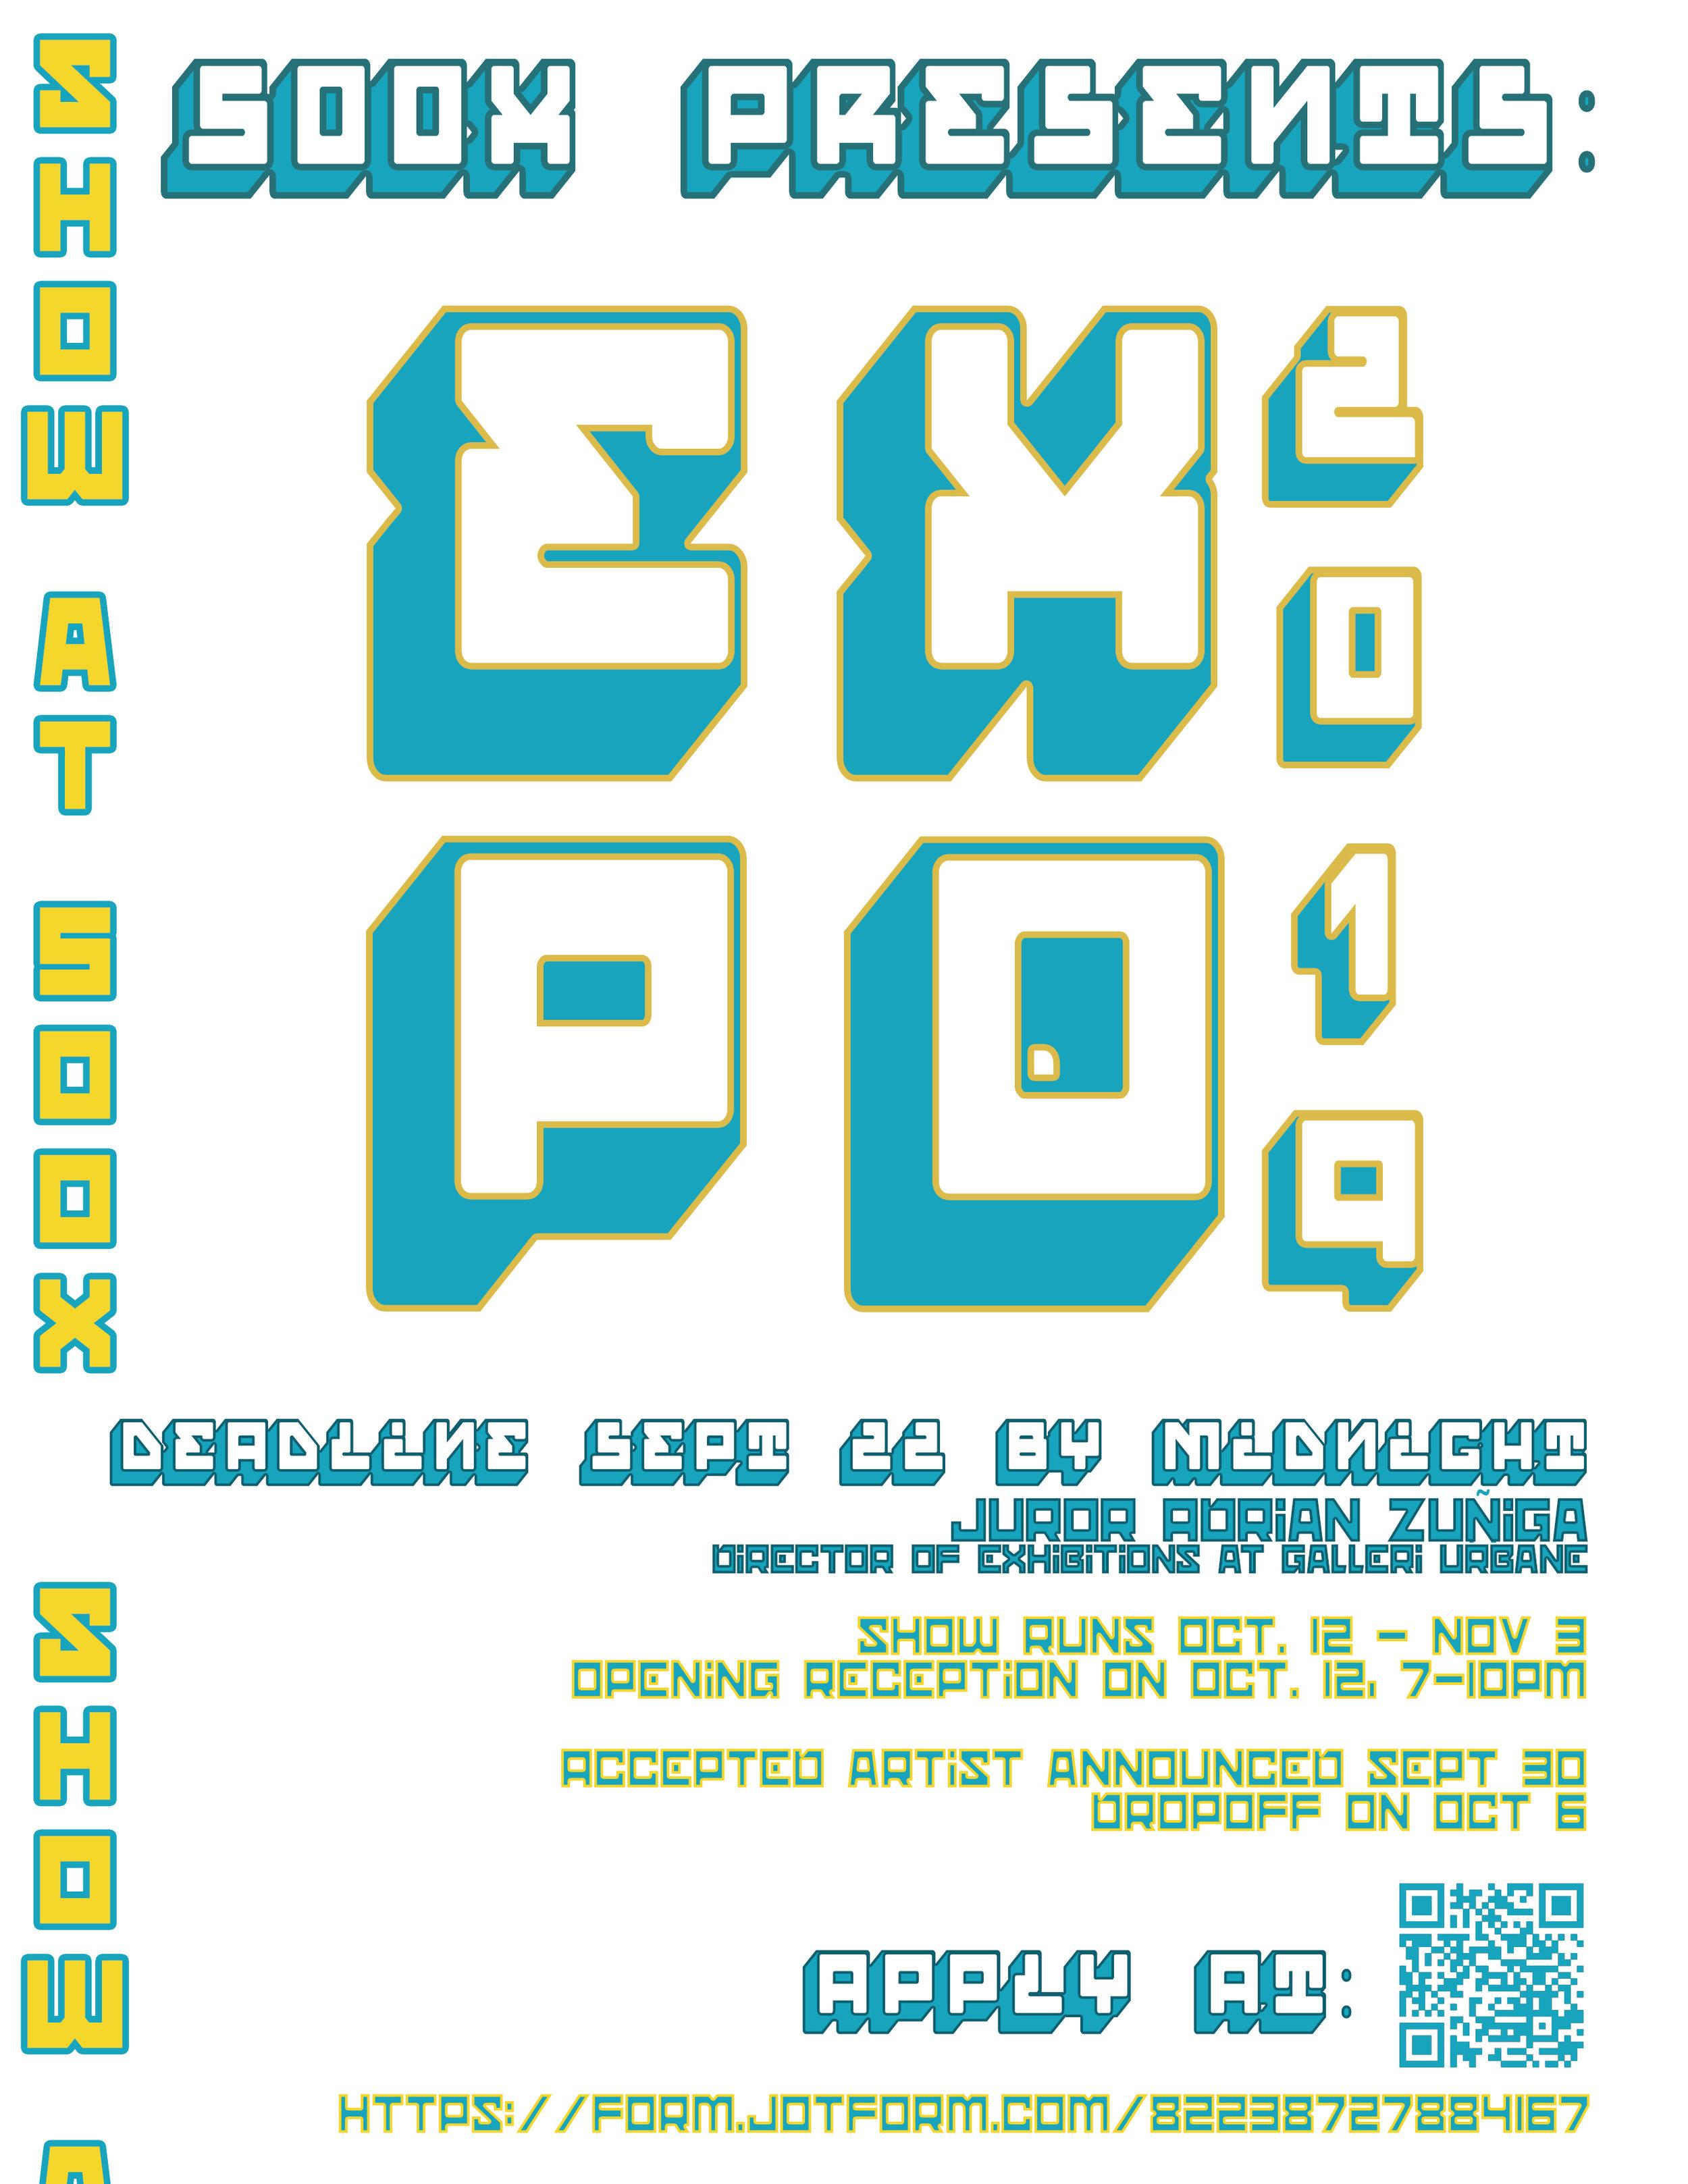 500x_Expo2019_Flyer.jpg